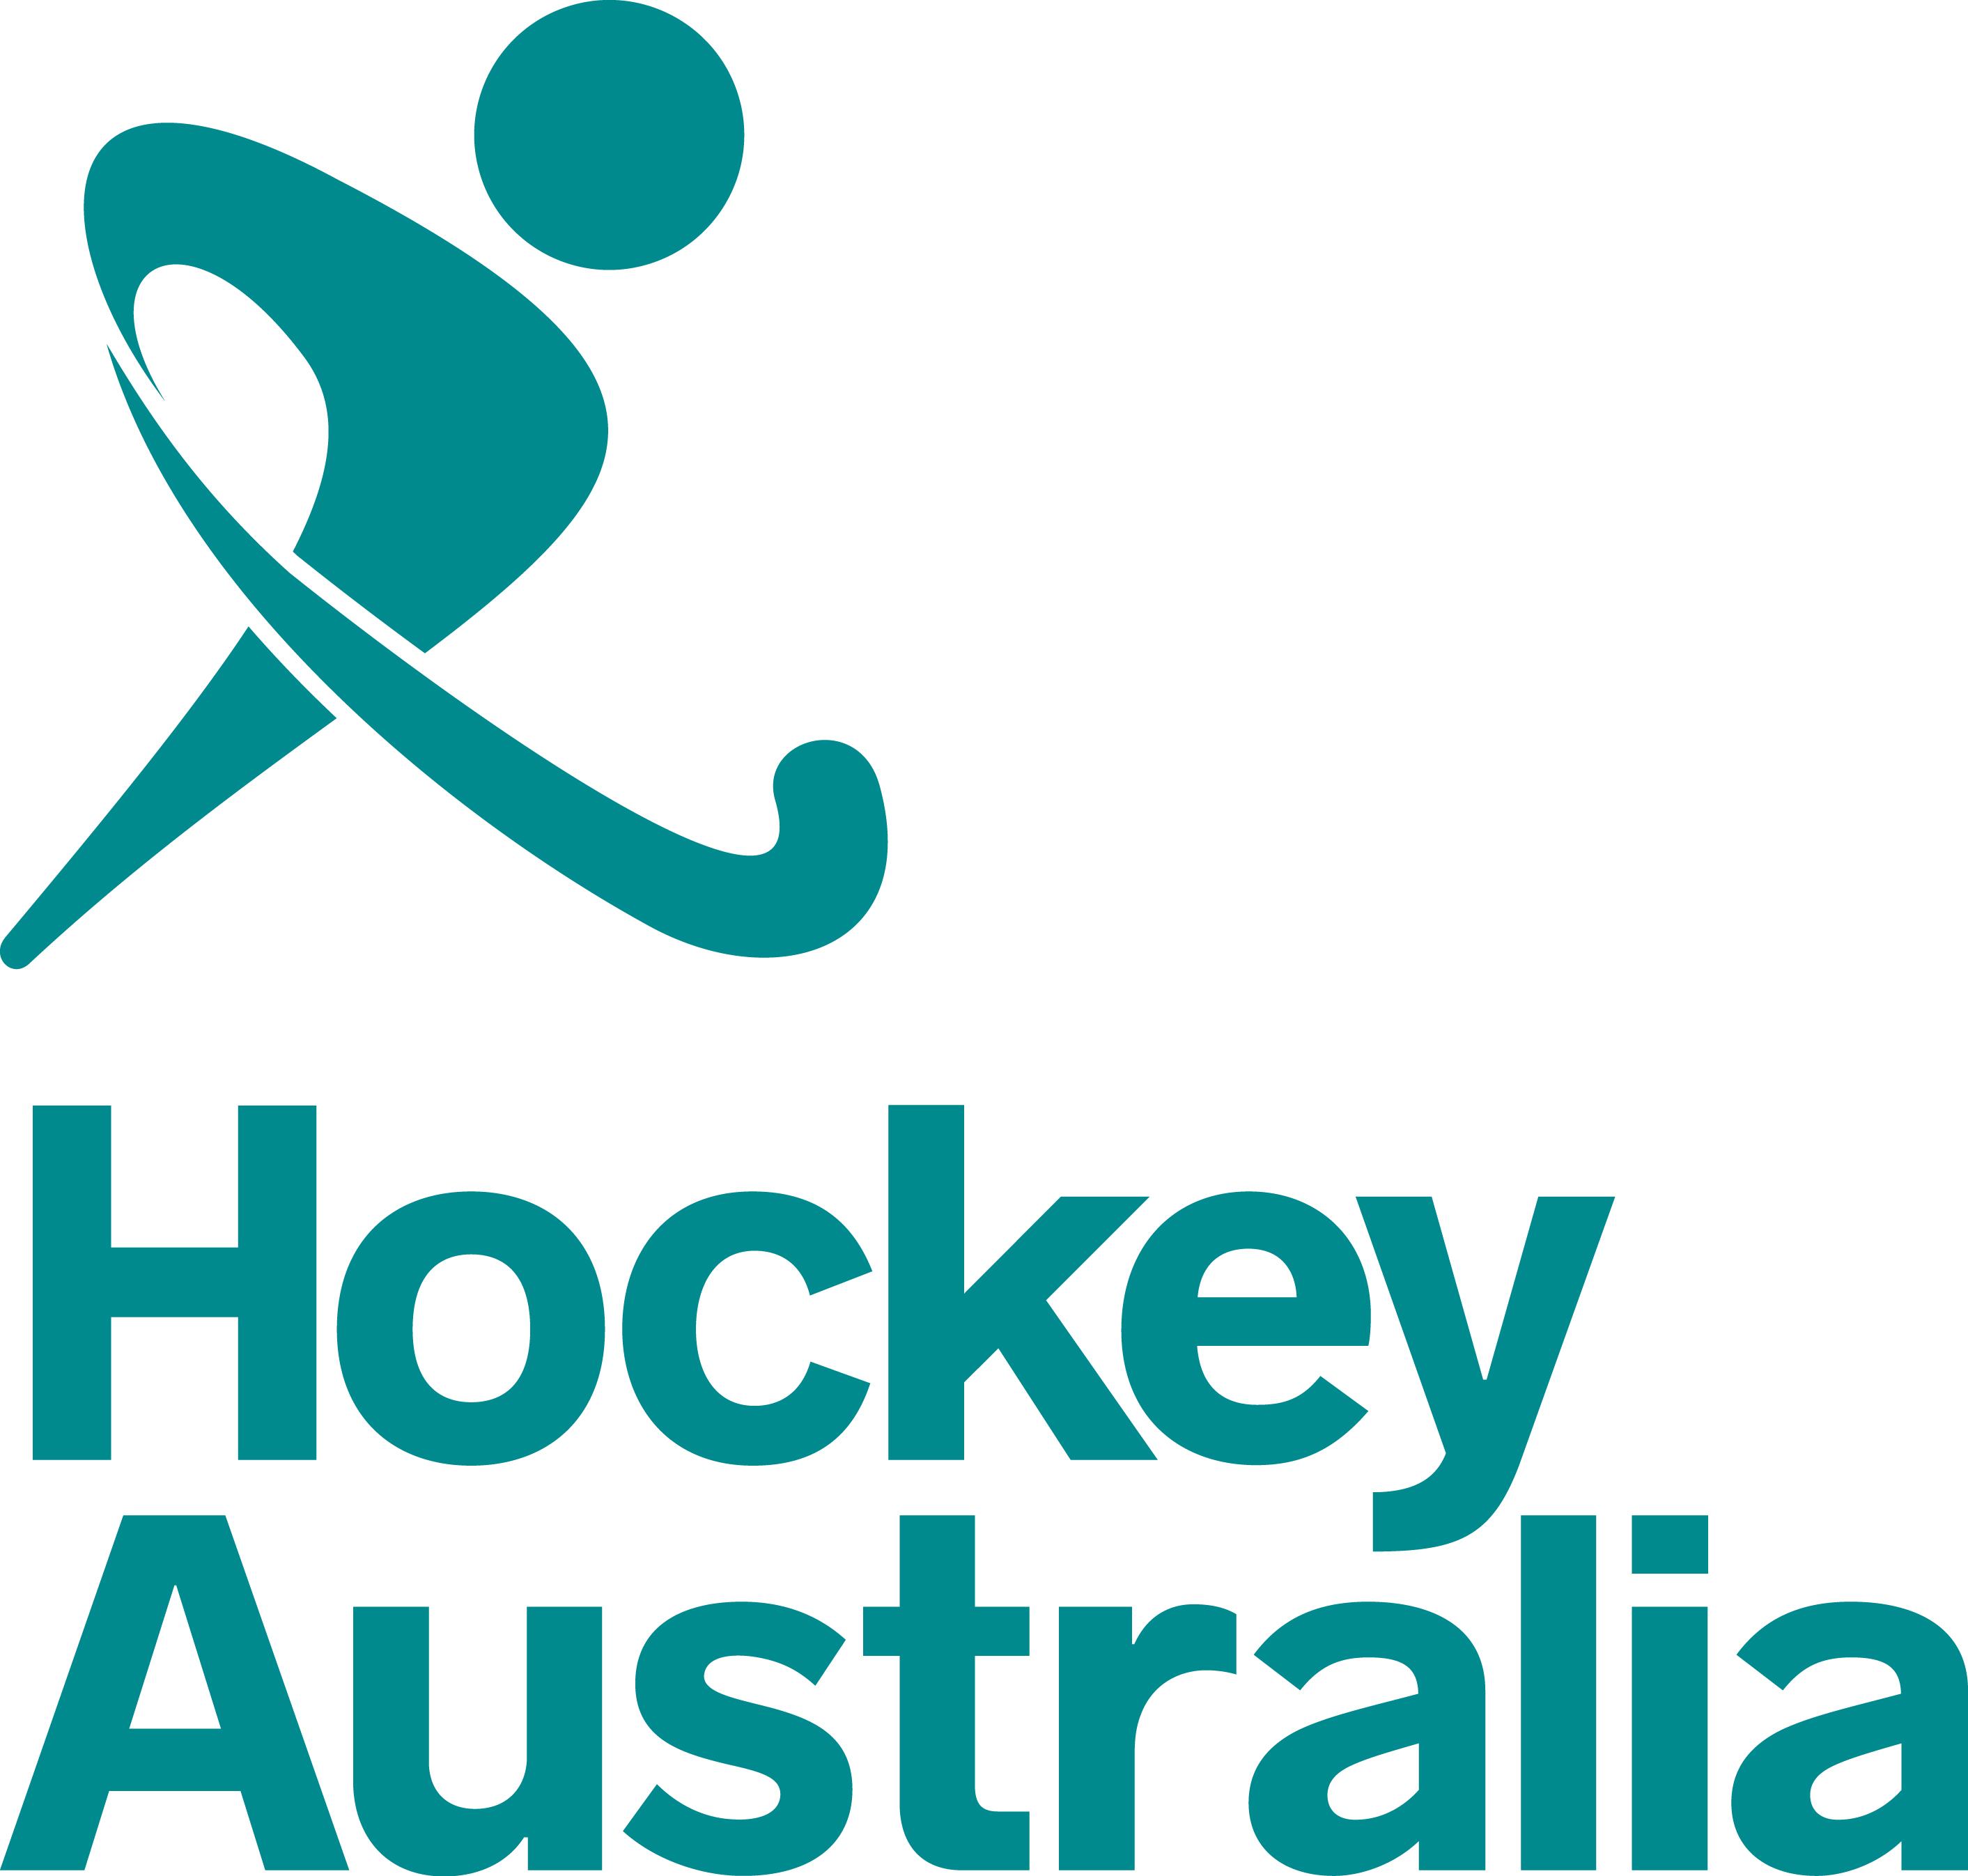 Hockey Australia - Wikipedia